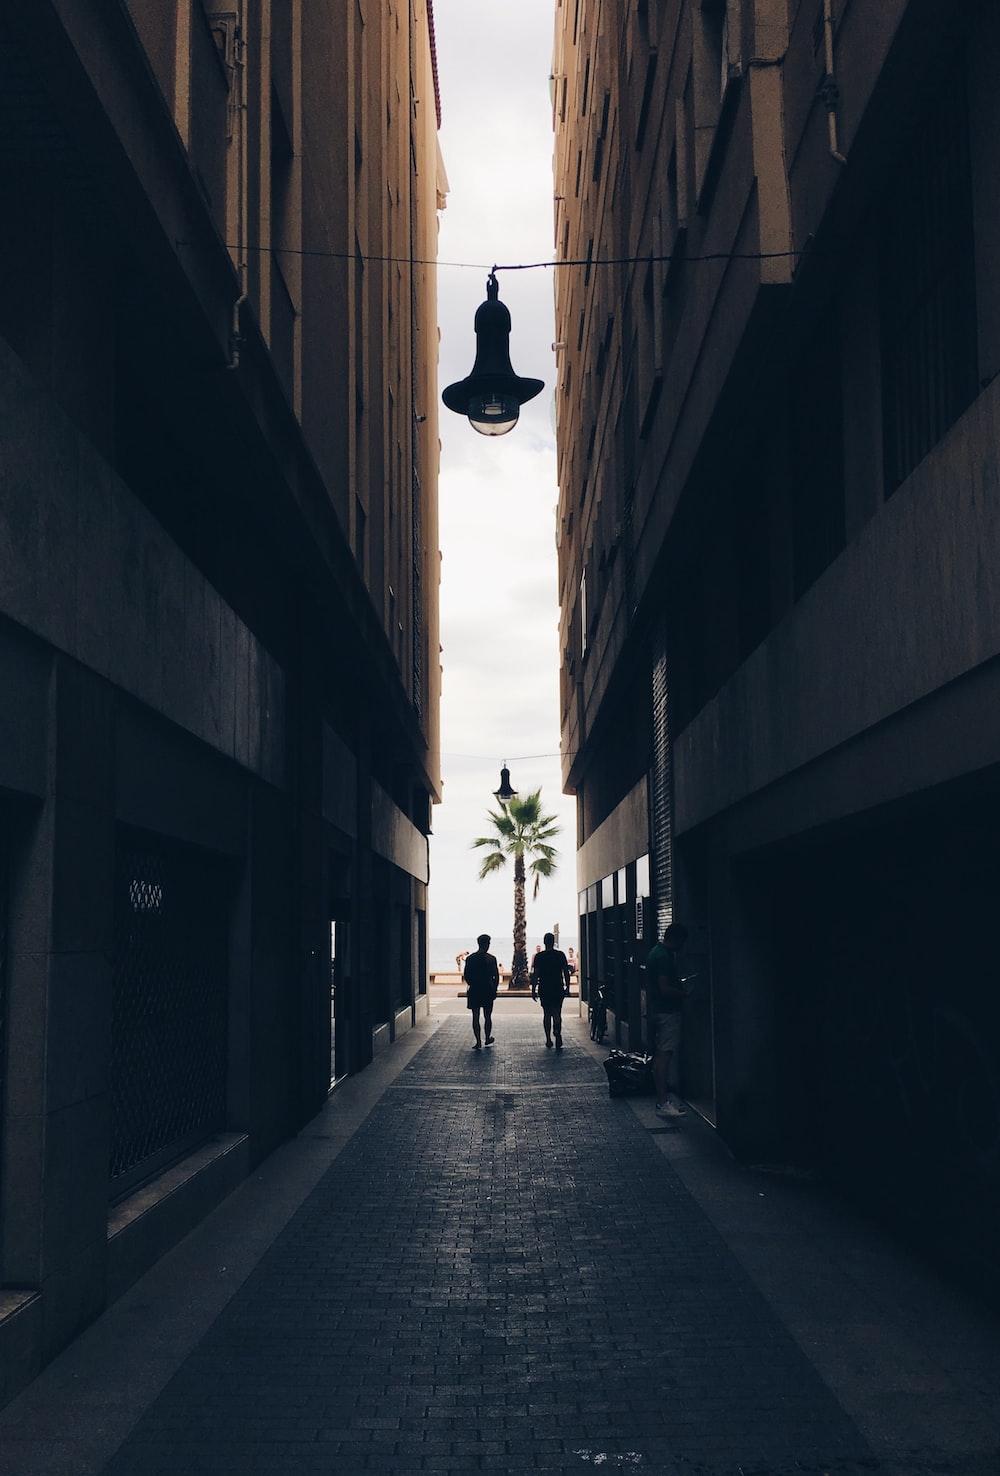 2 person walking on hallway